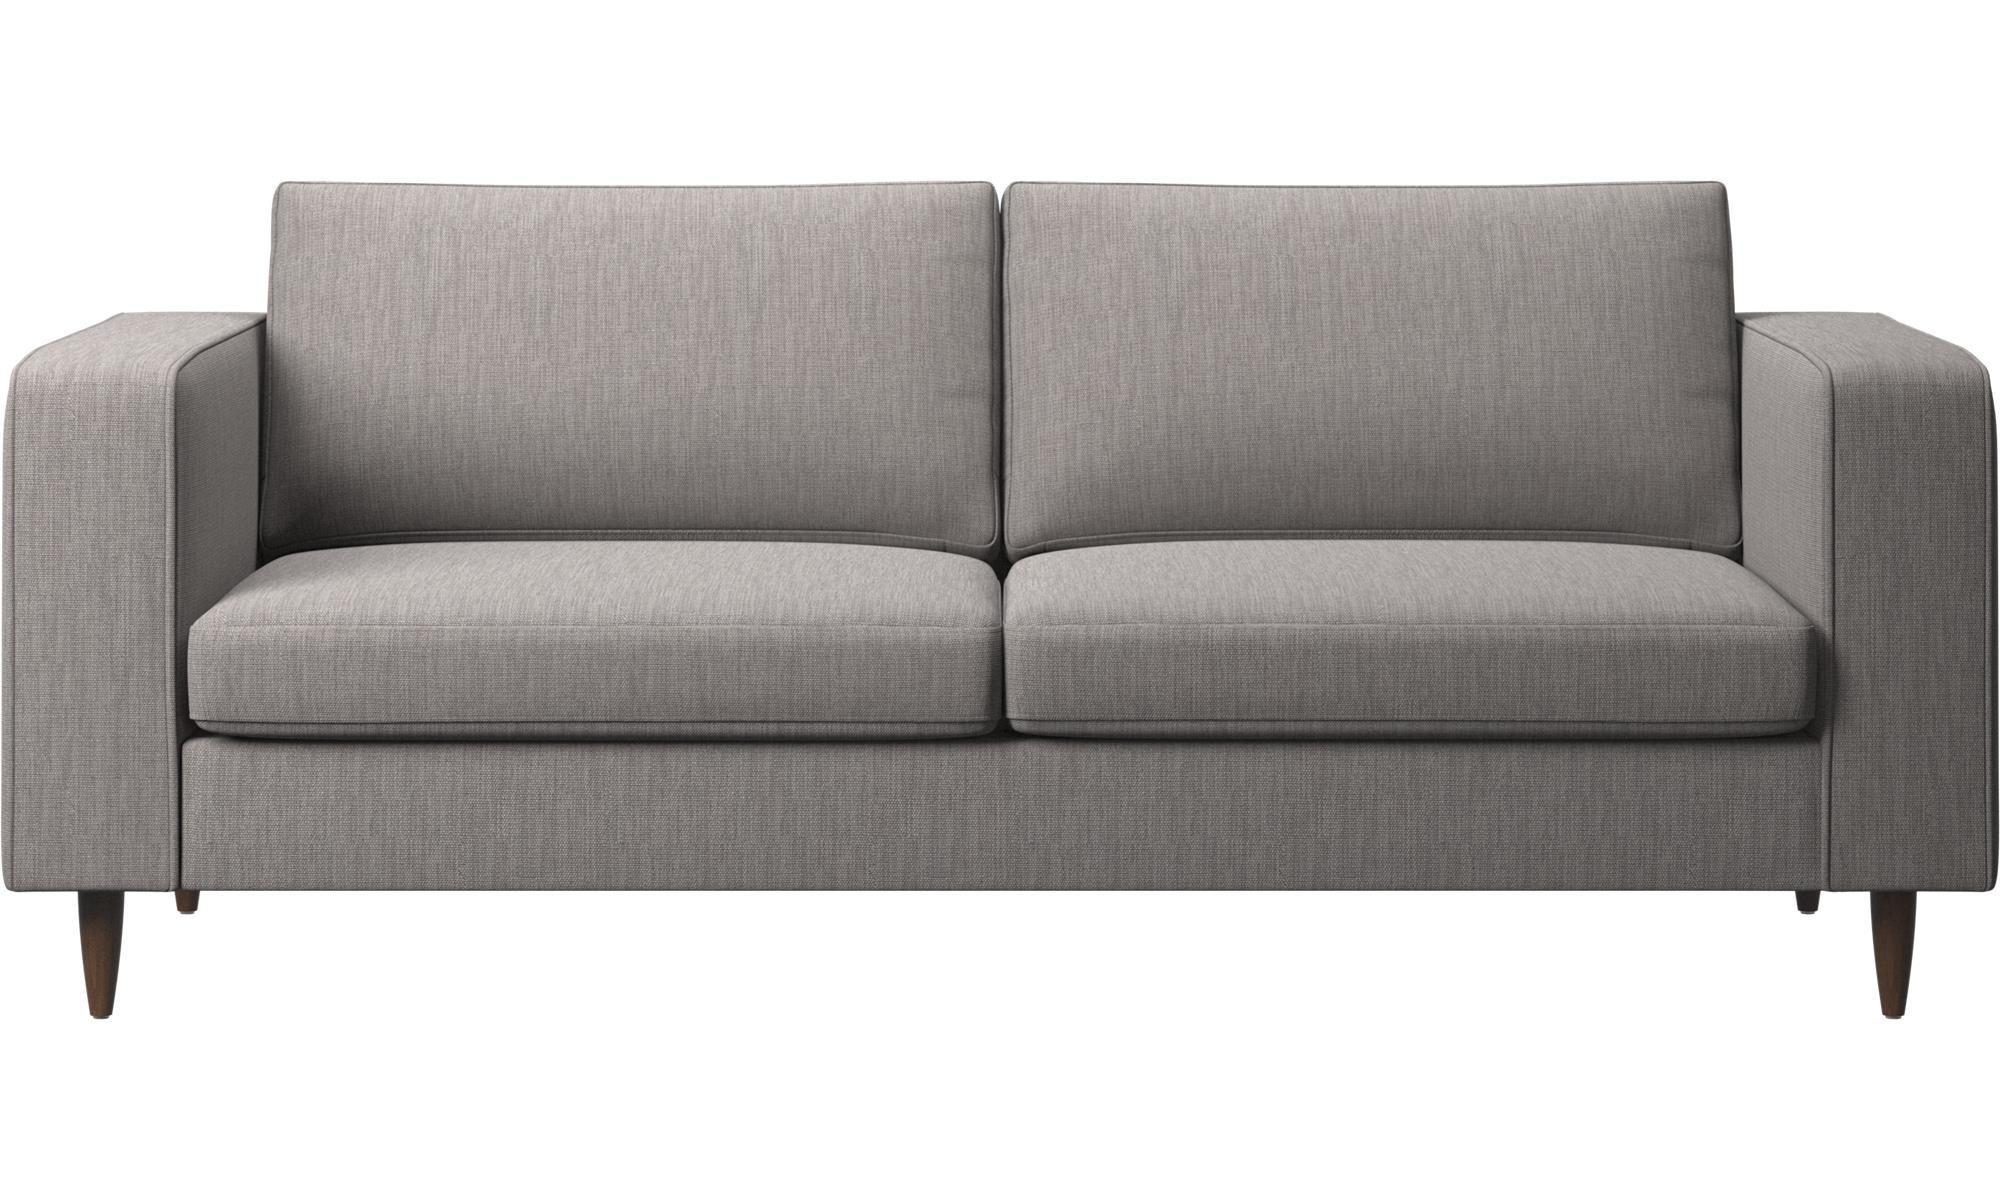 Indivi Sofa 5 Seater Sofa Sofa Sofa Design